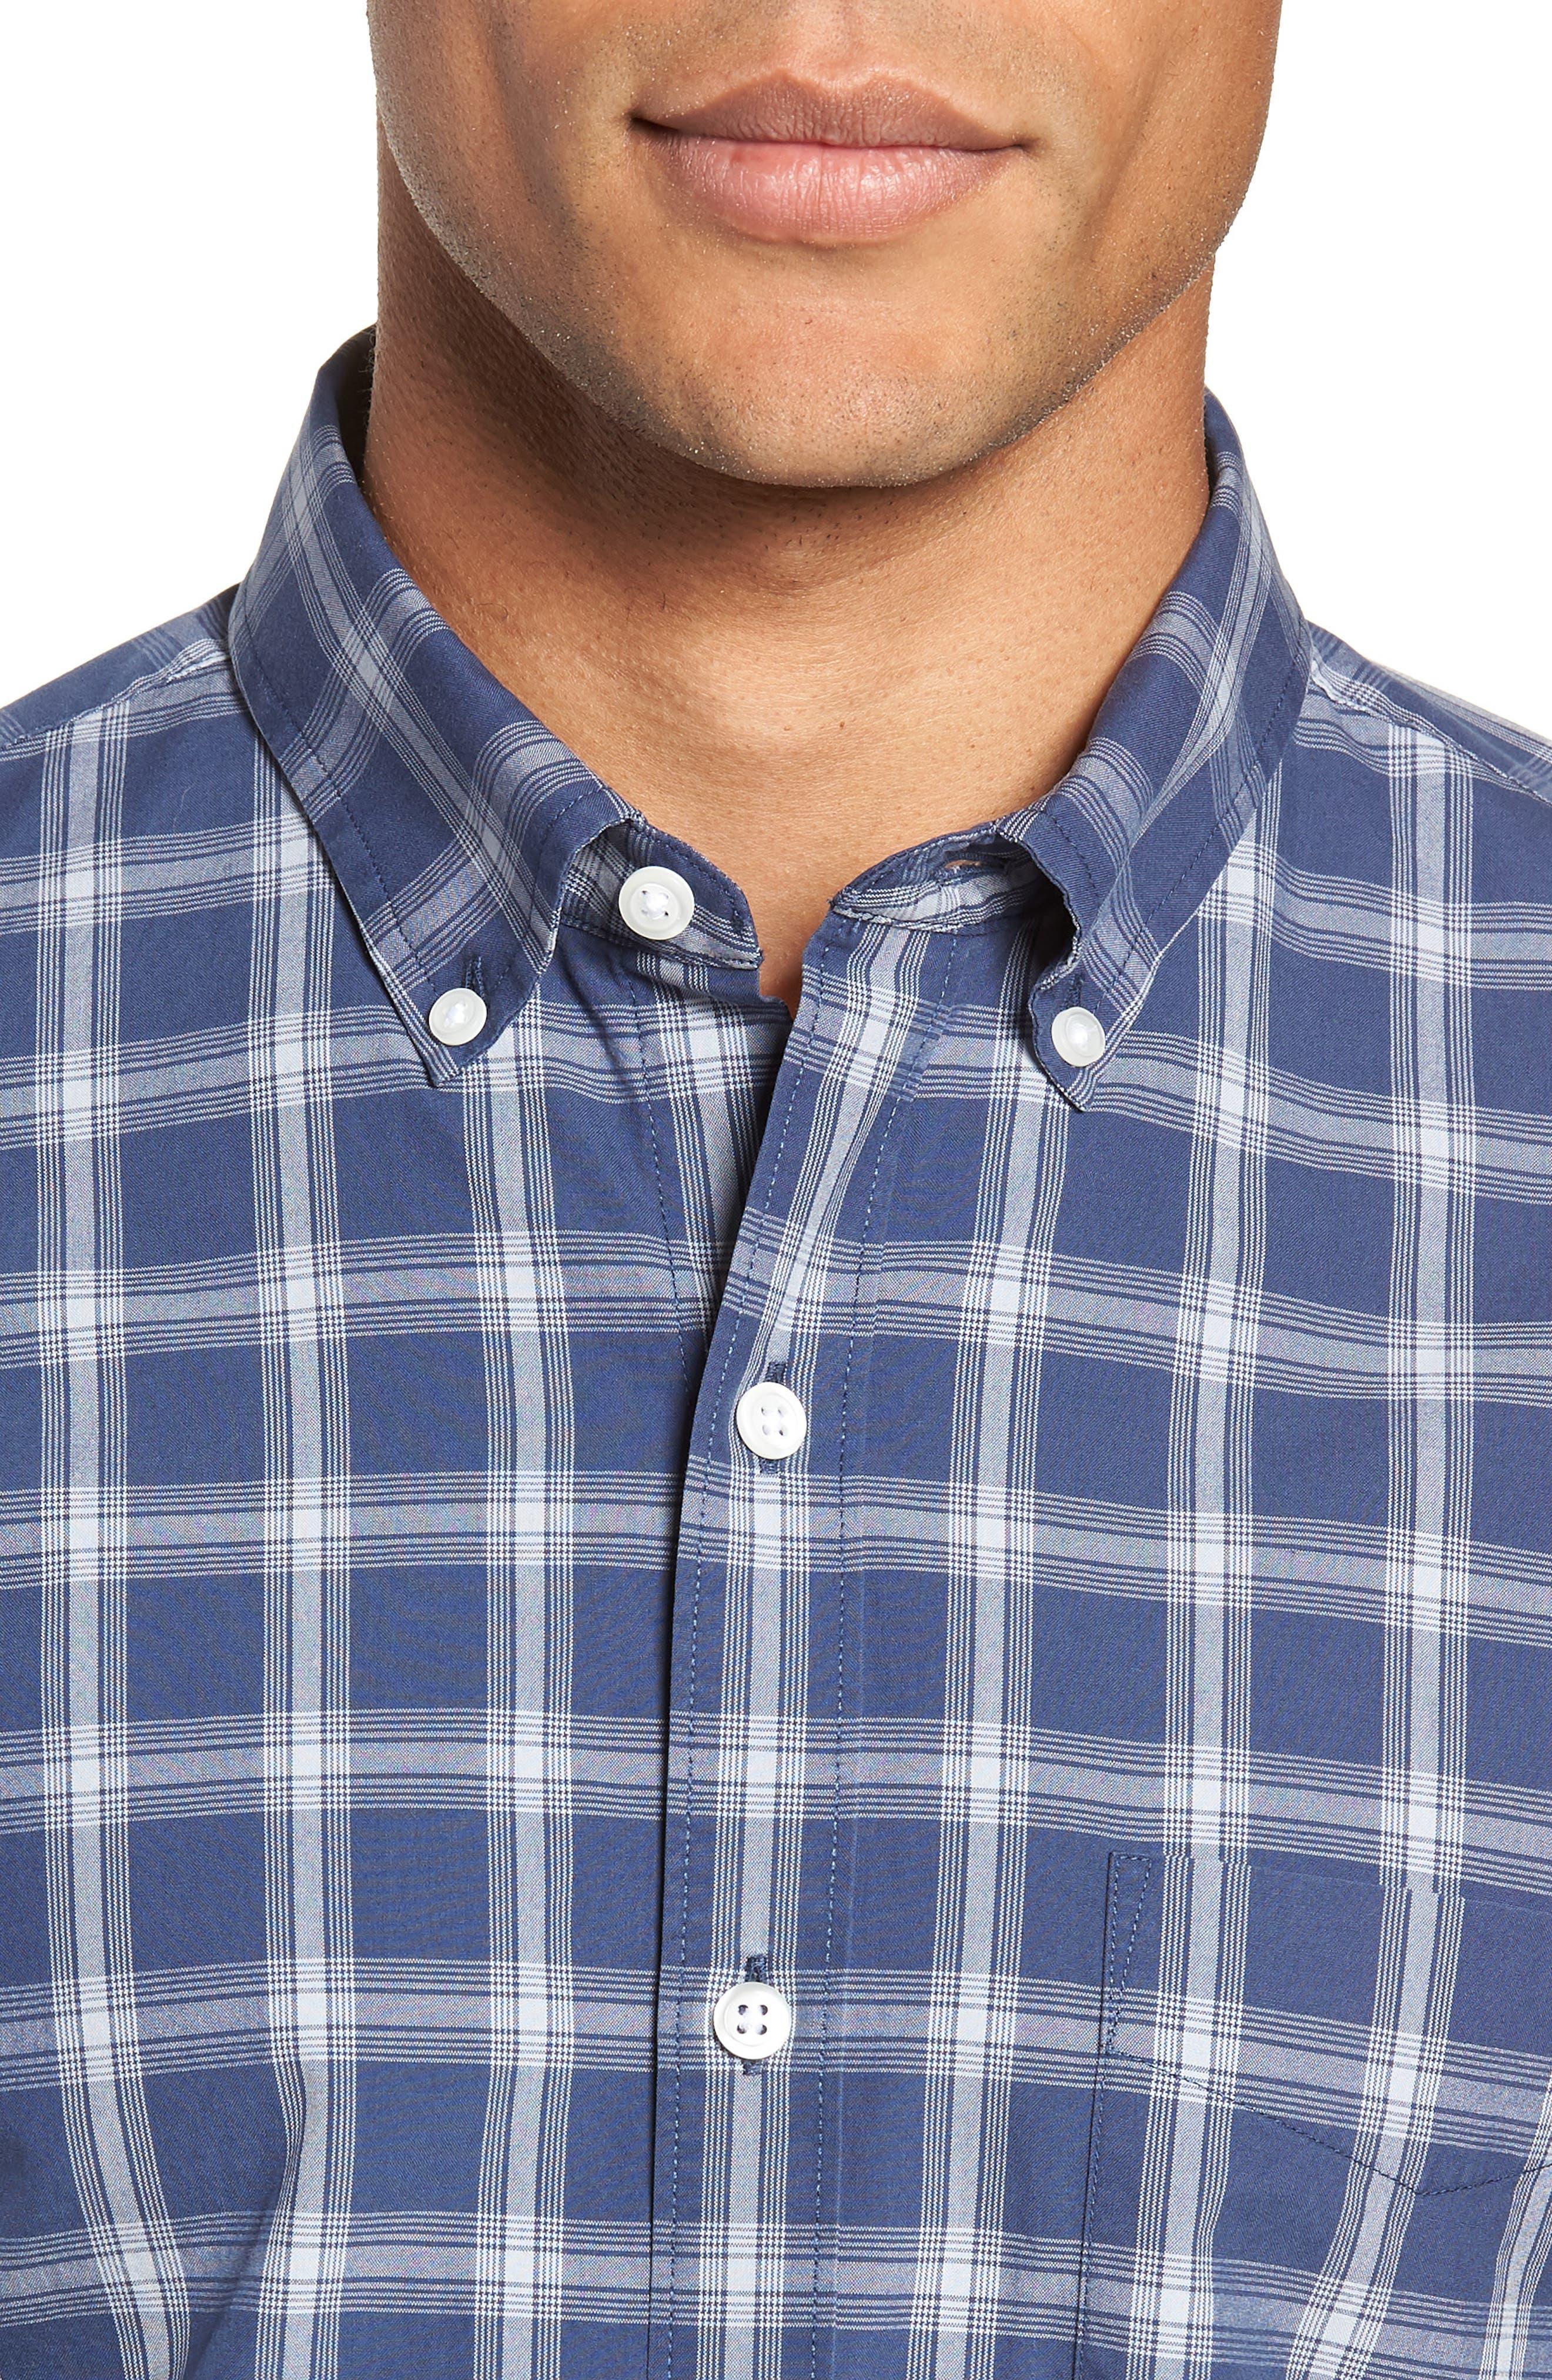 BONOBOS, Washed Button Down Slim Fit Plaid Sport Shirt, Alternate thumbnail 2, color, 400